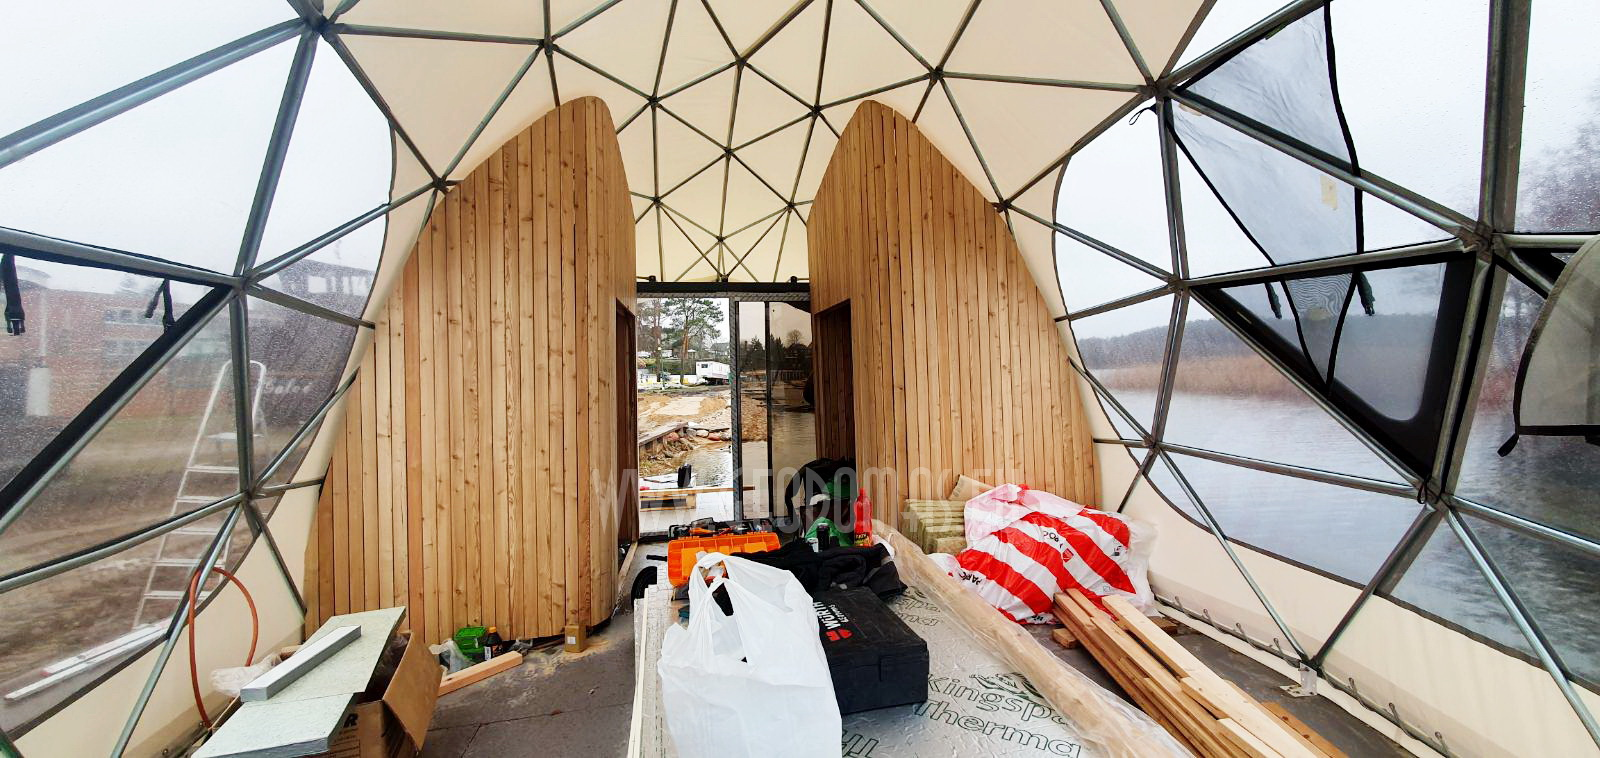 27m² Floating Glamping Dome Ø7m   Recreational Yacht, Trakai